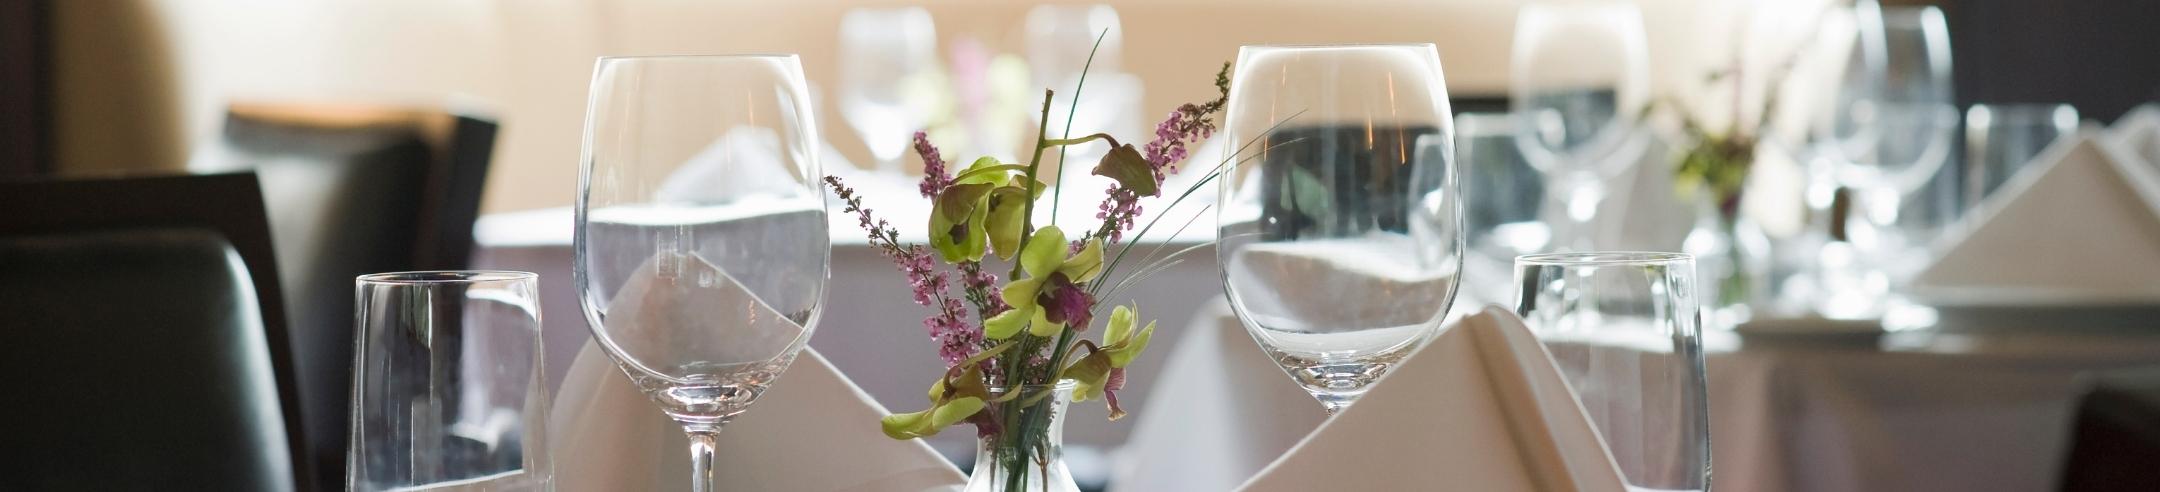 Wine glasses table setting.